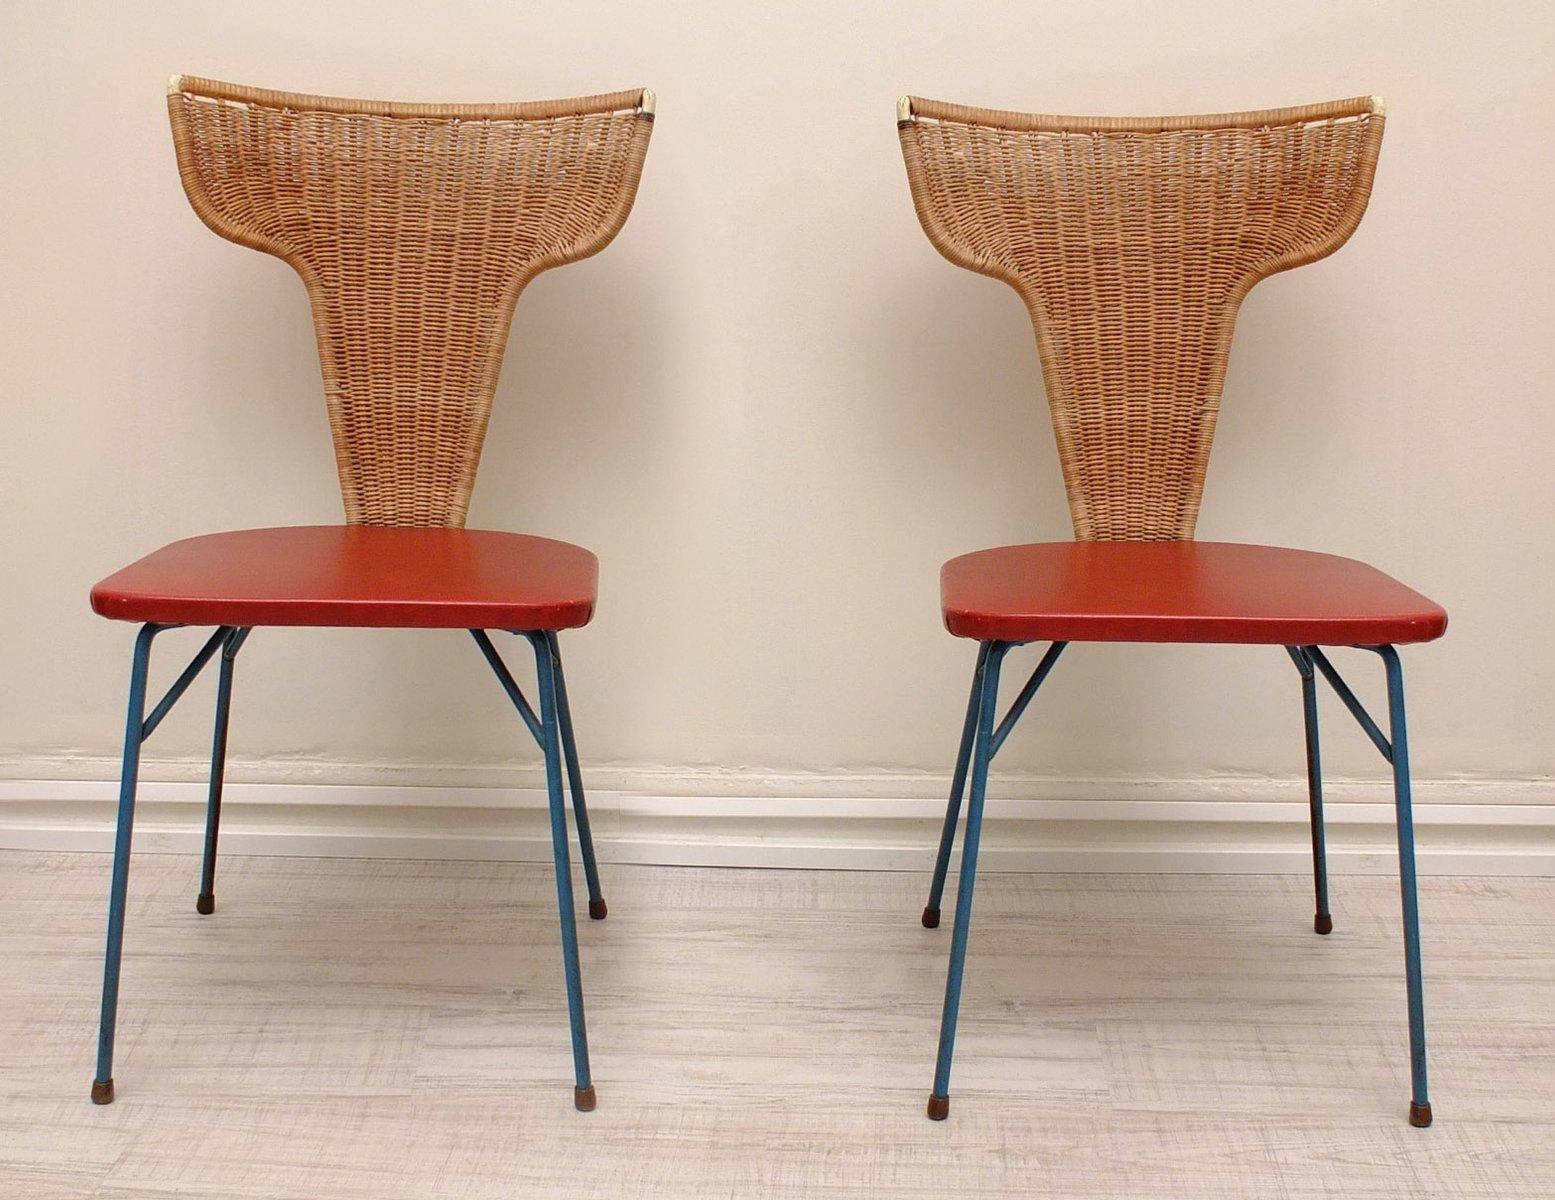 italienische st hle aus eisen rattan 1950er 2er set. Black Bedroom Furniture Sets. Home Design Ideas